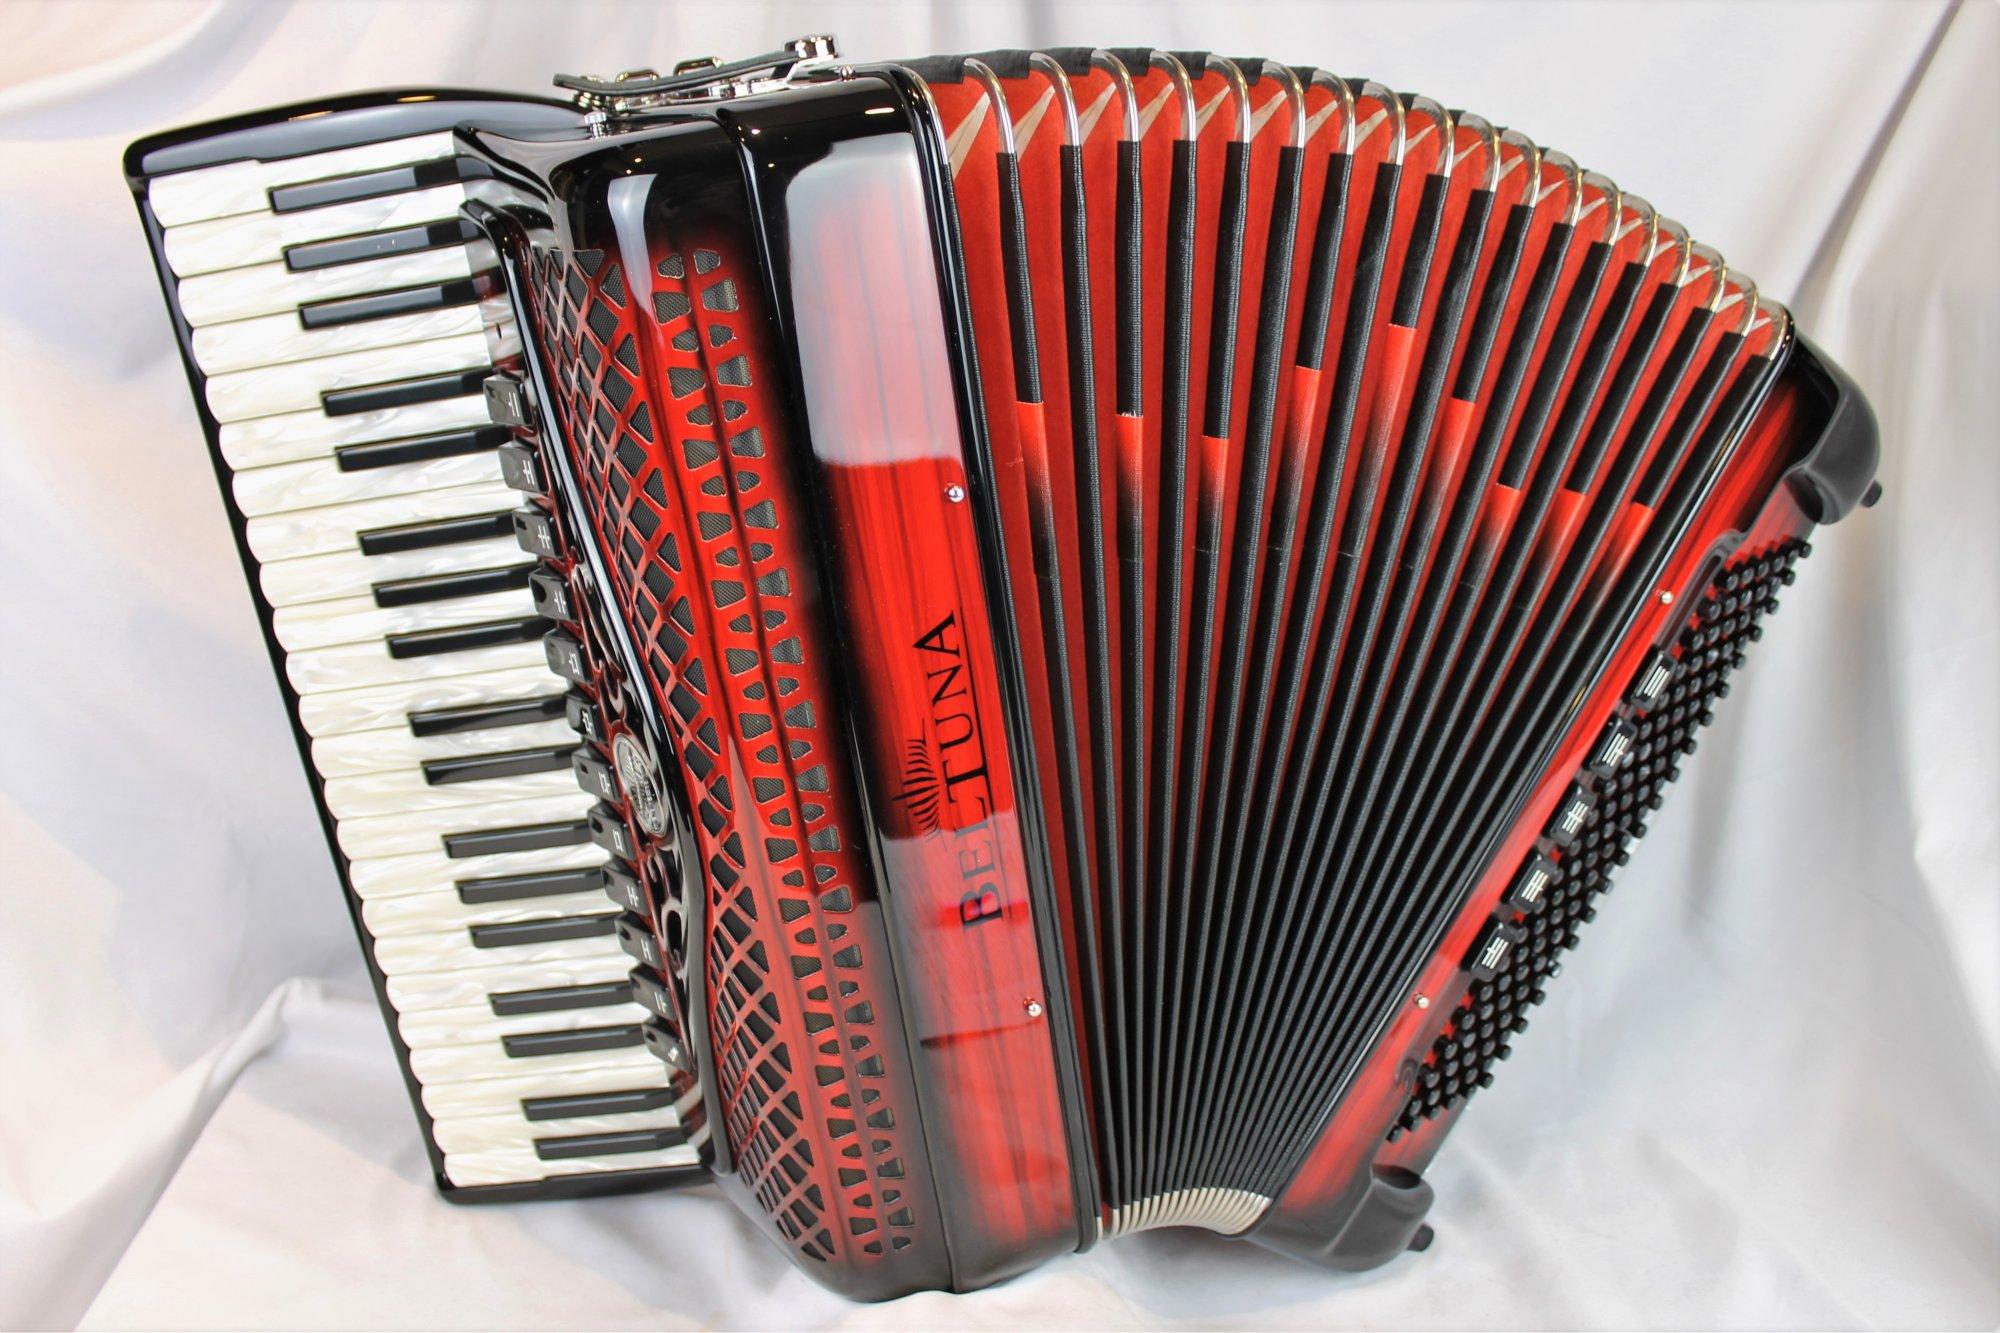 NEW Red Shadow Beltuna Studio IV Compact Piano Accordion LMMH 41 120